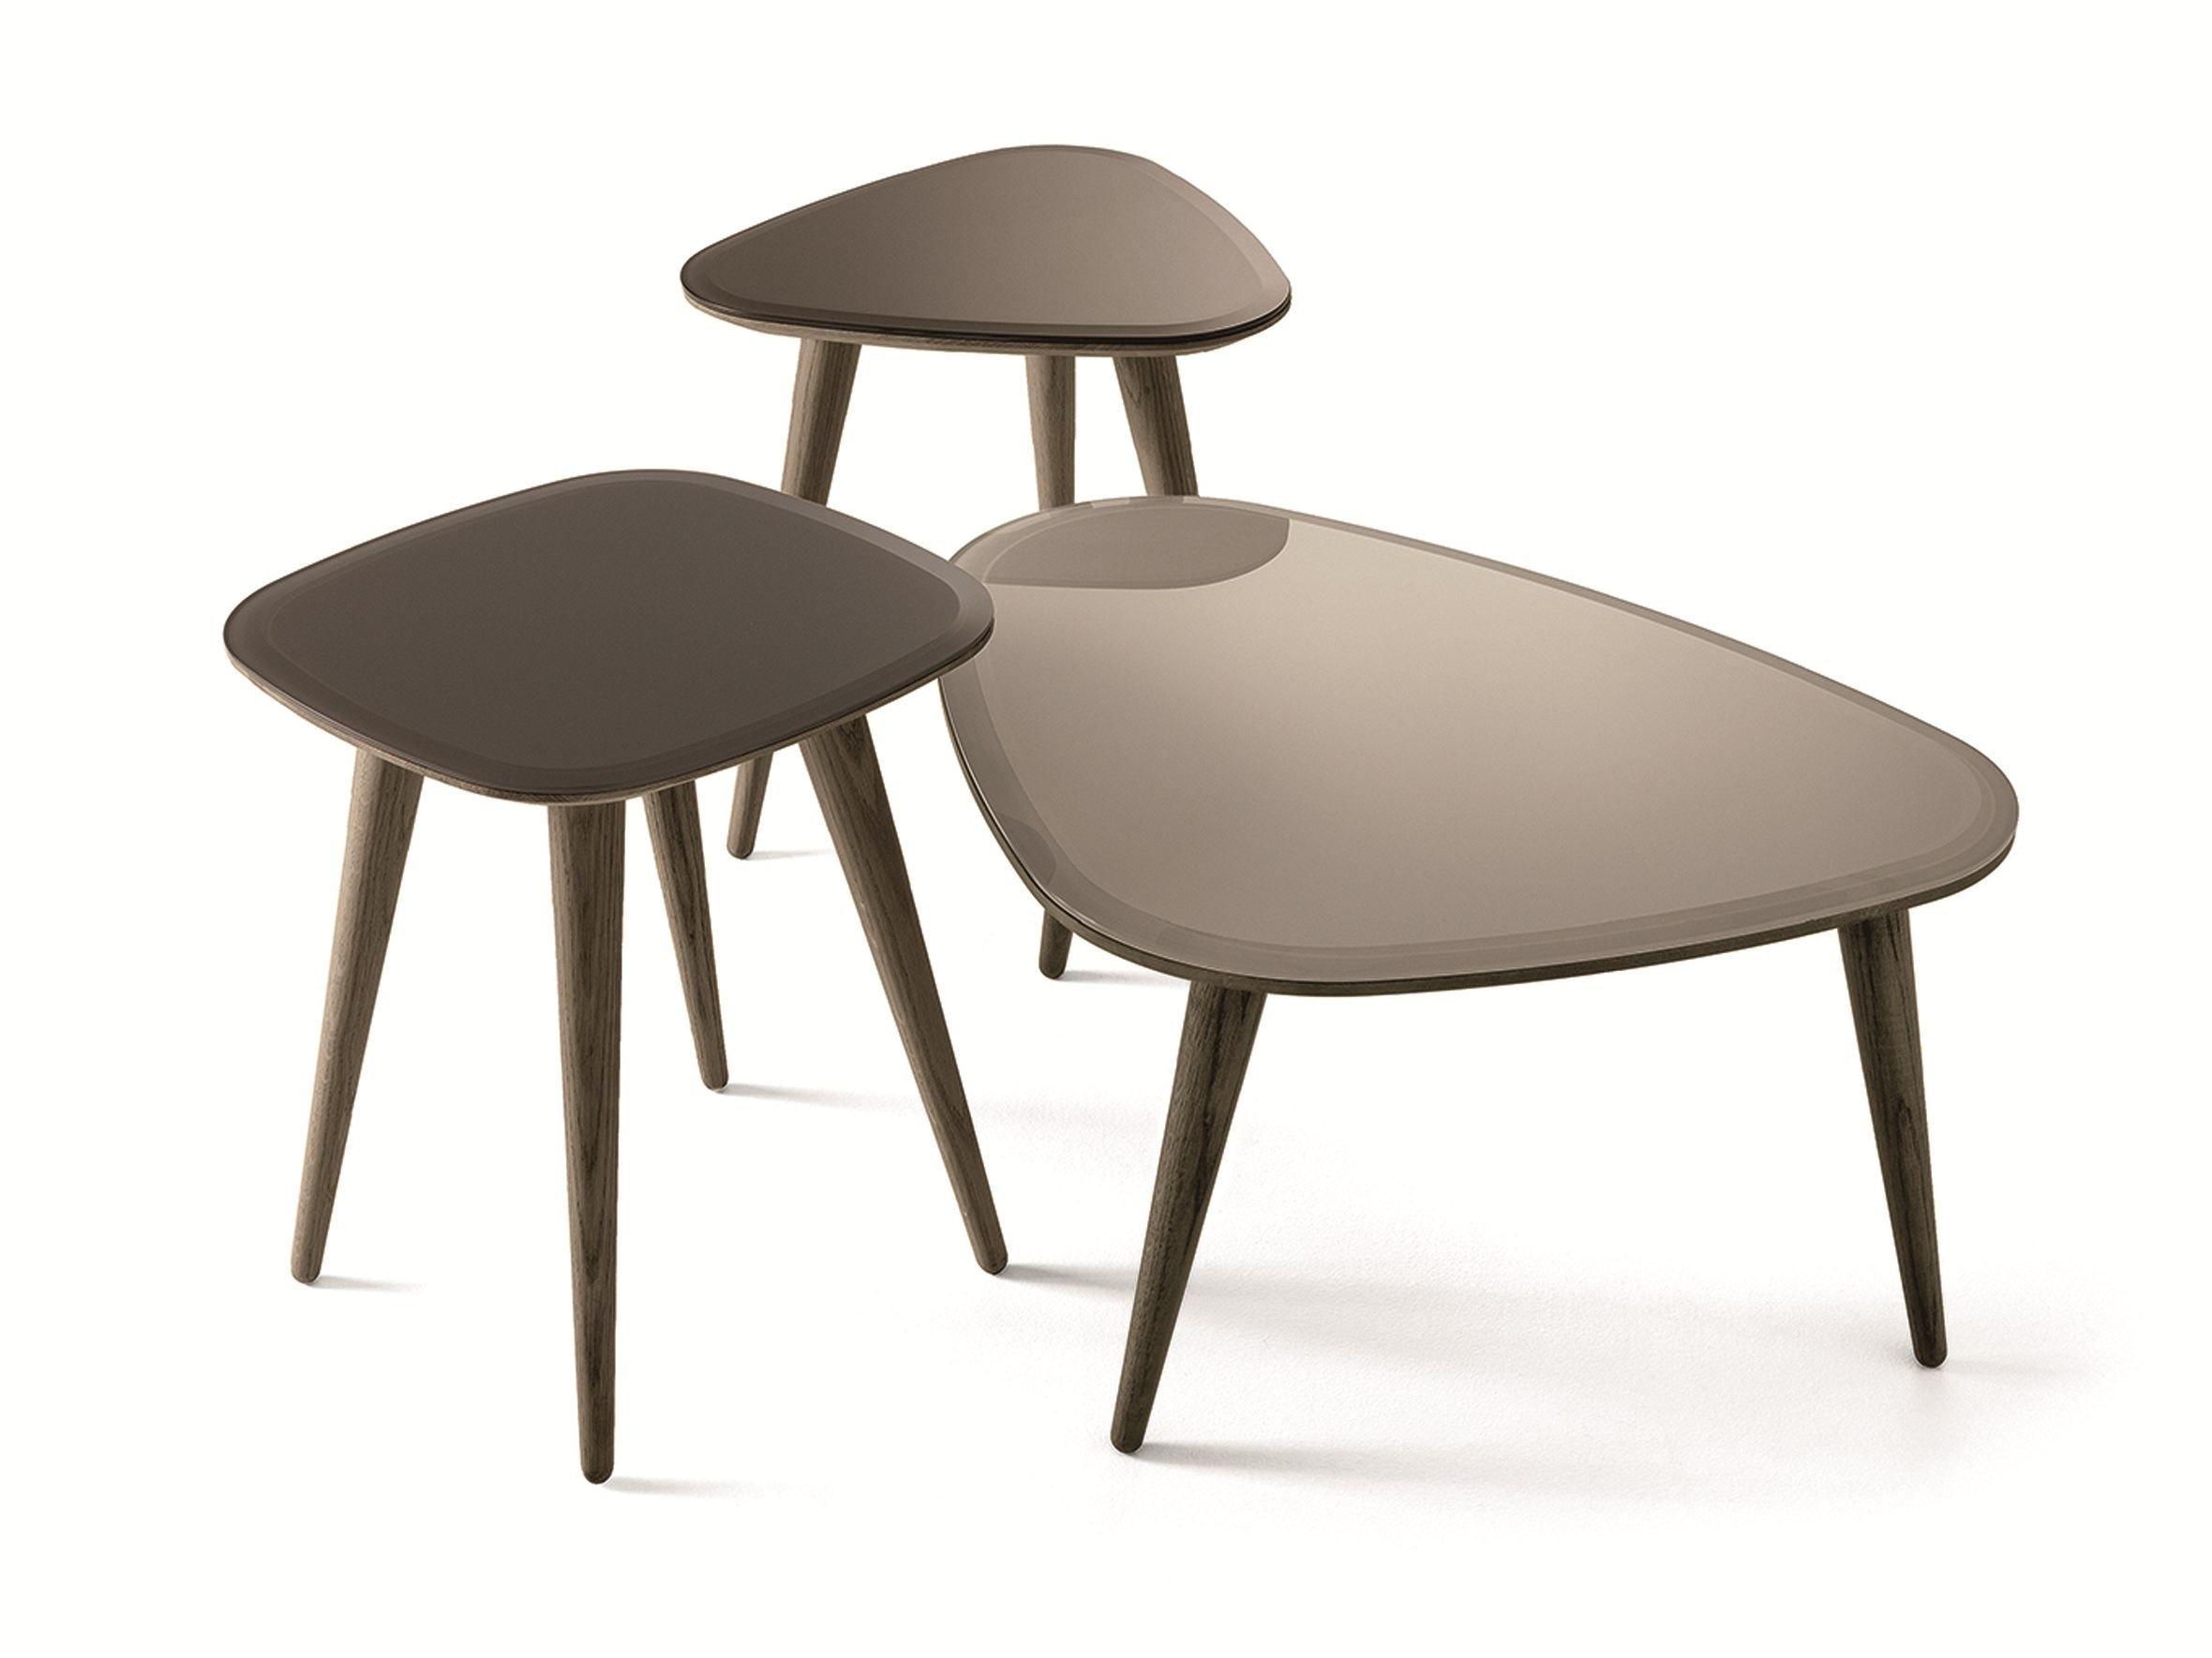 oak coffee table fifties by gallotti radice design studio g r. Black Bedroom Furniture Sets. Home Design Ideas